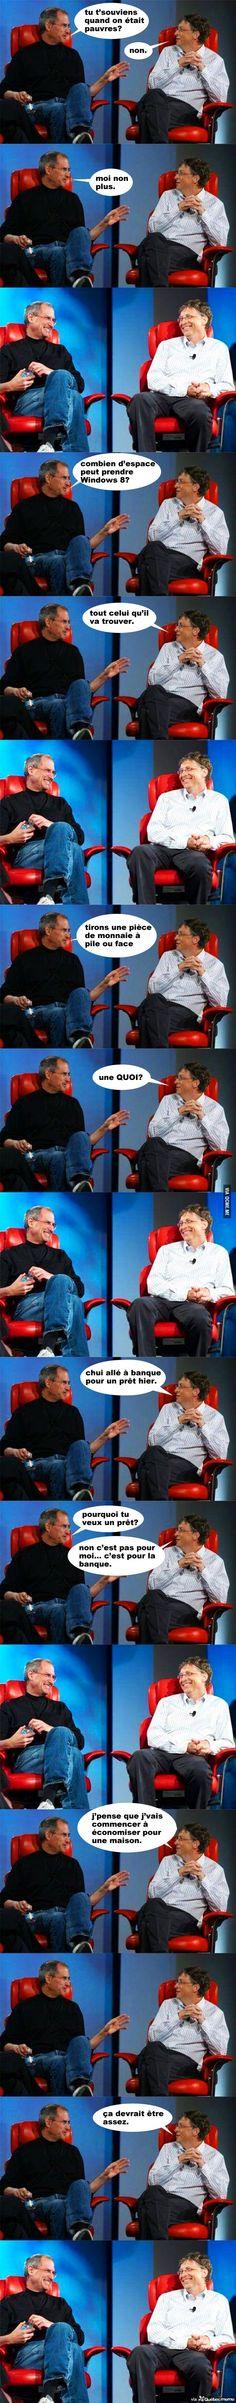 Les Meilleures Jokes de Steve Jobs et Bill Gates